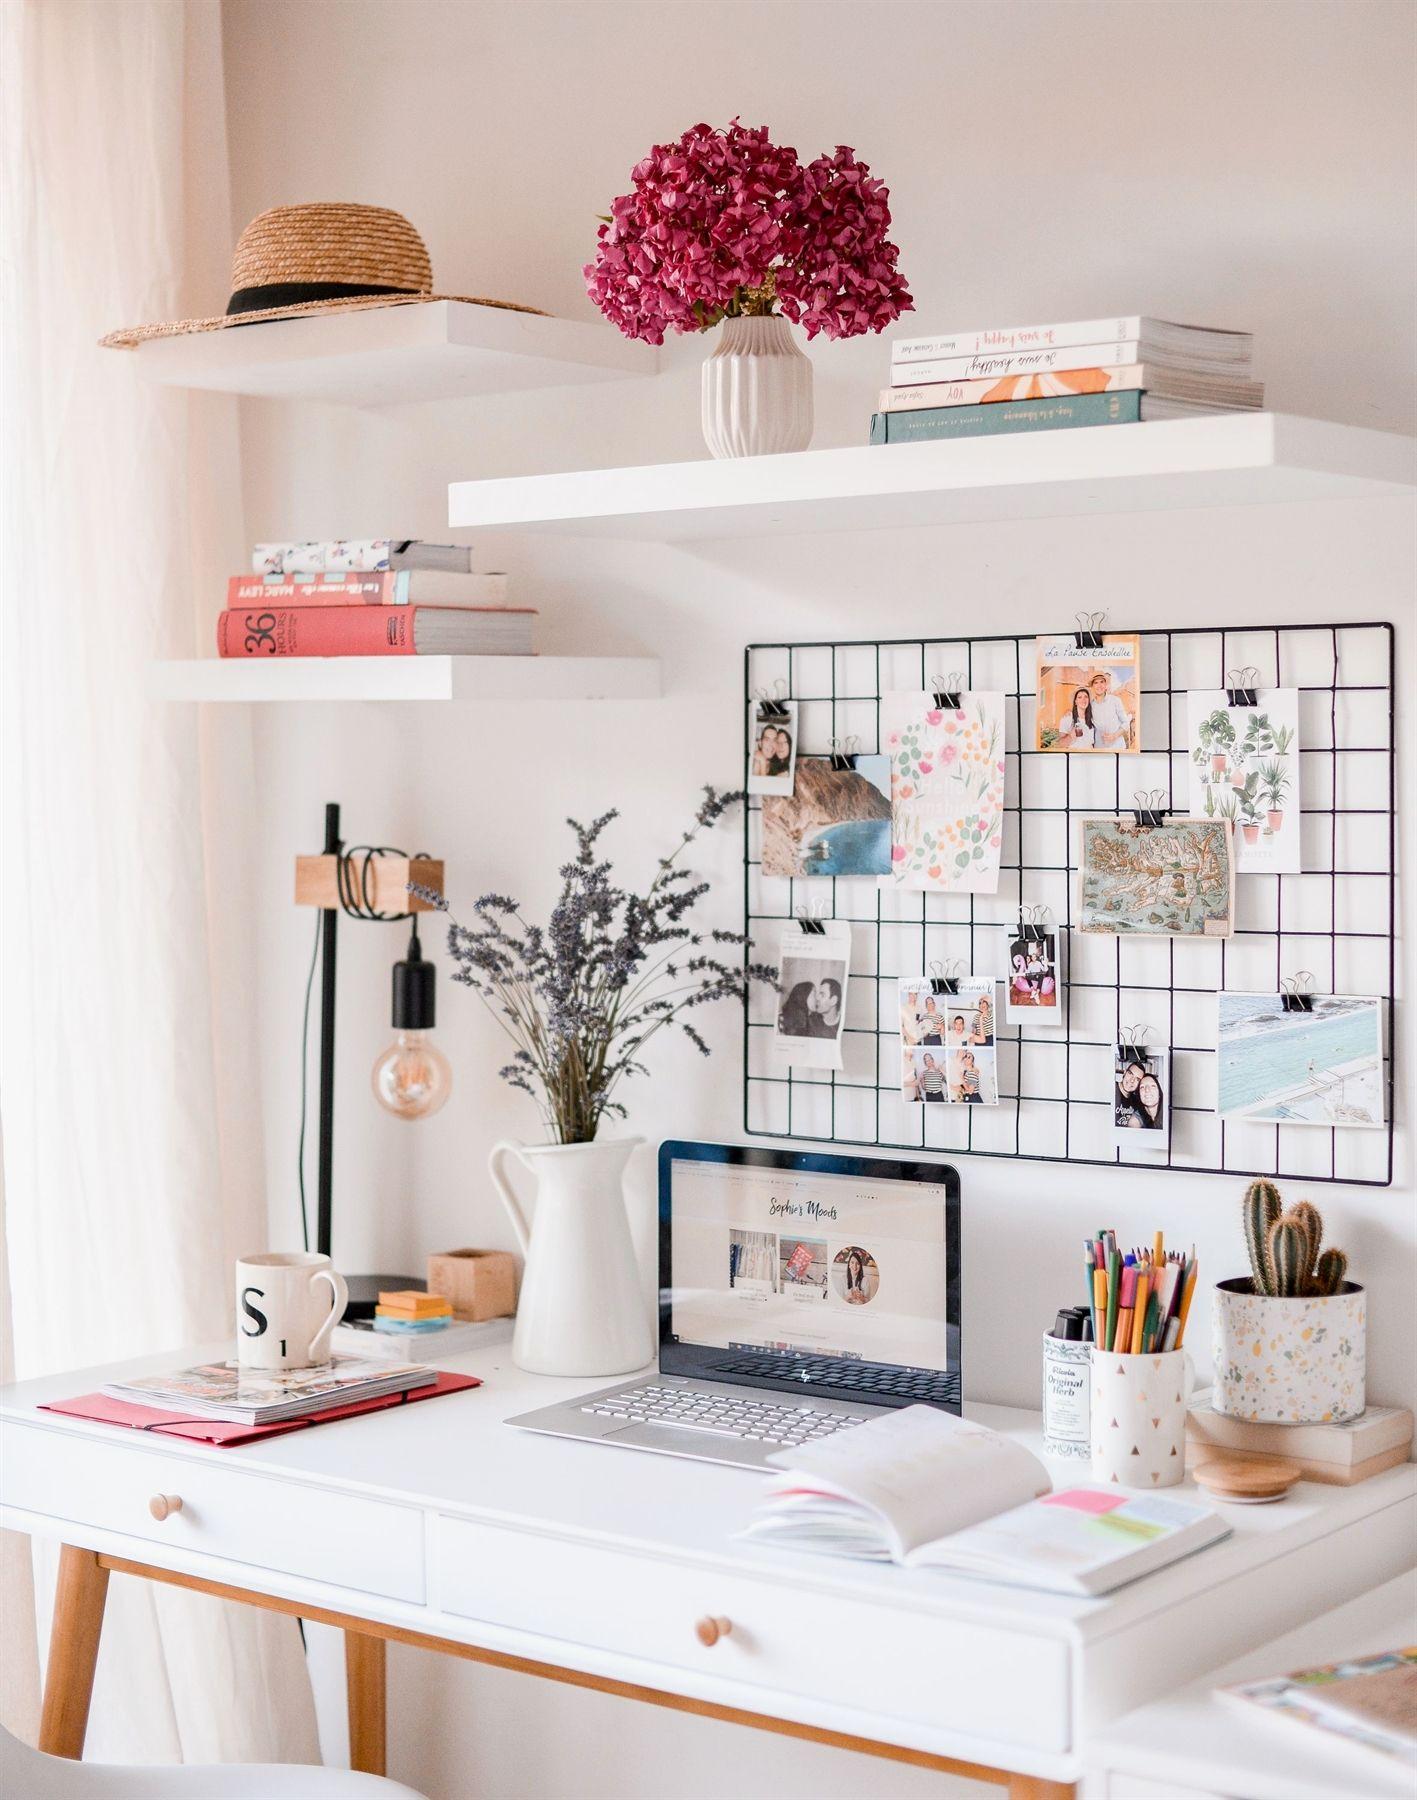 Cheap Interior Decor Saleprice 24 Study Room Decor Small